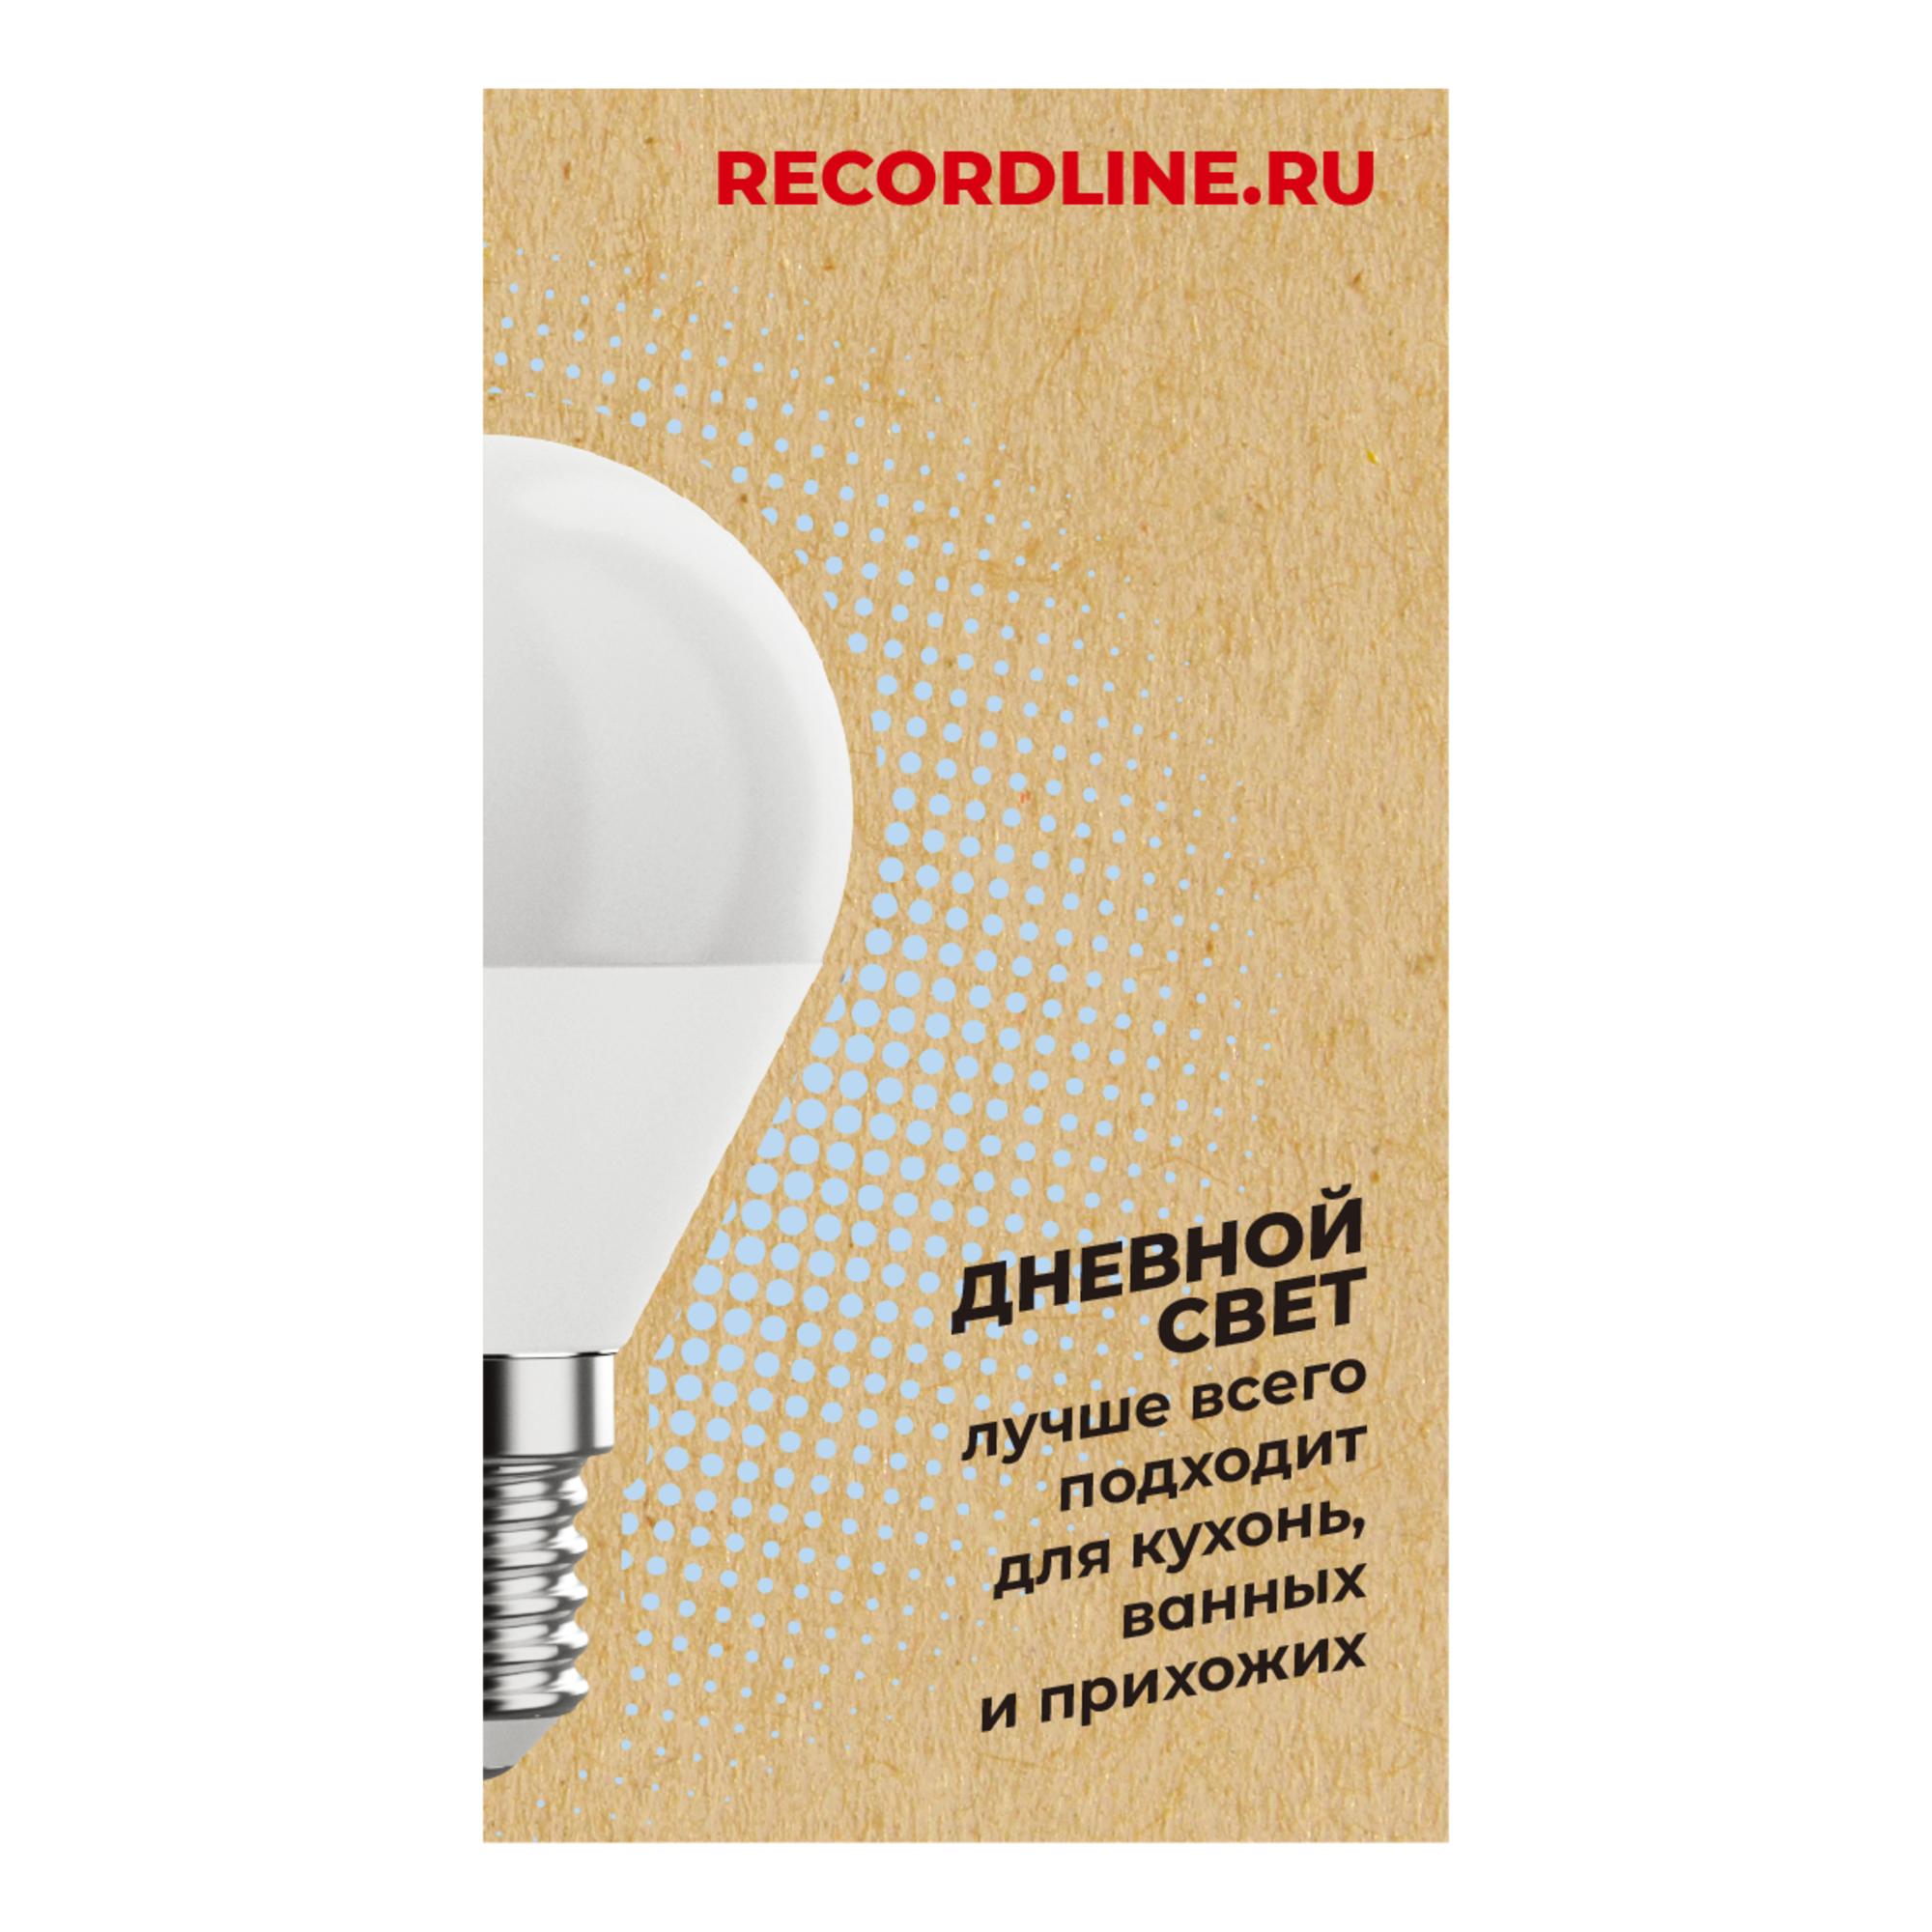 Светодиодная лампочка Рекорд 23884 E14 70 Лм 7 Вт